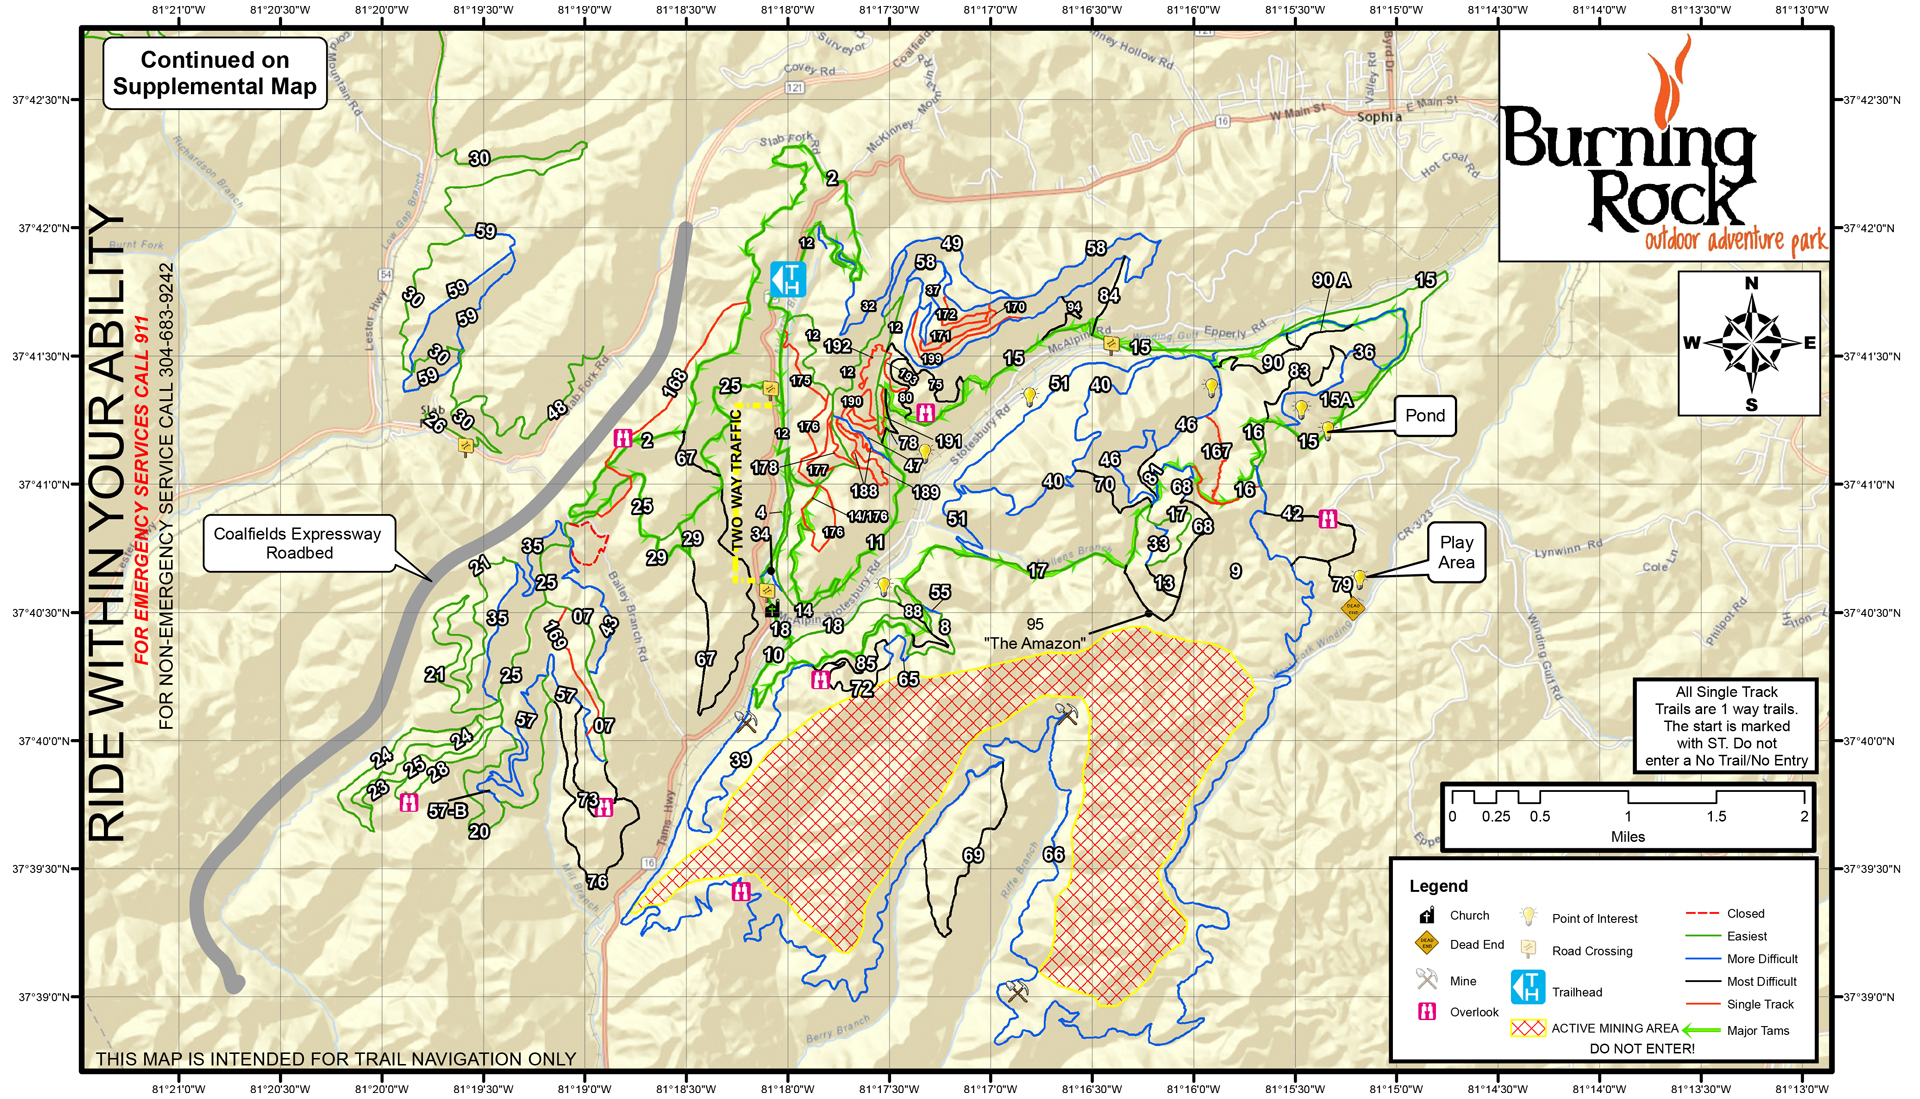 Ride Burning Rock WV - Wv map